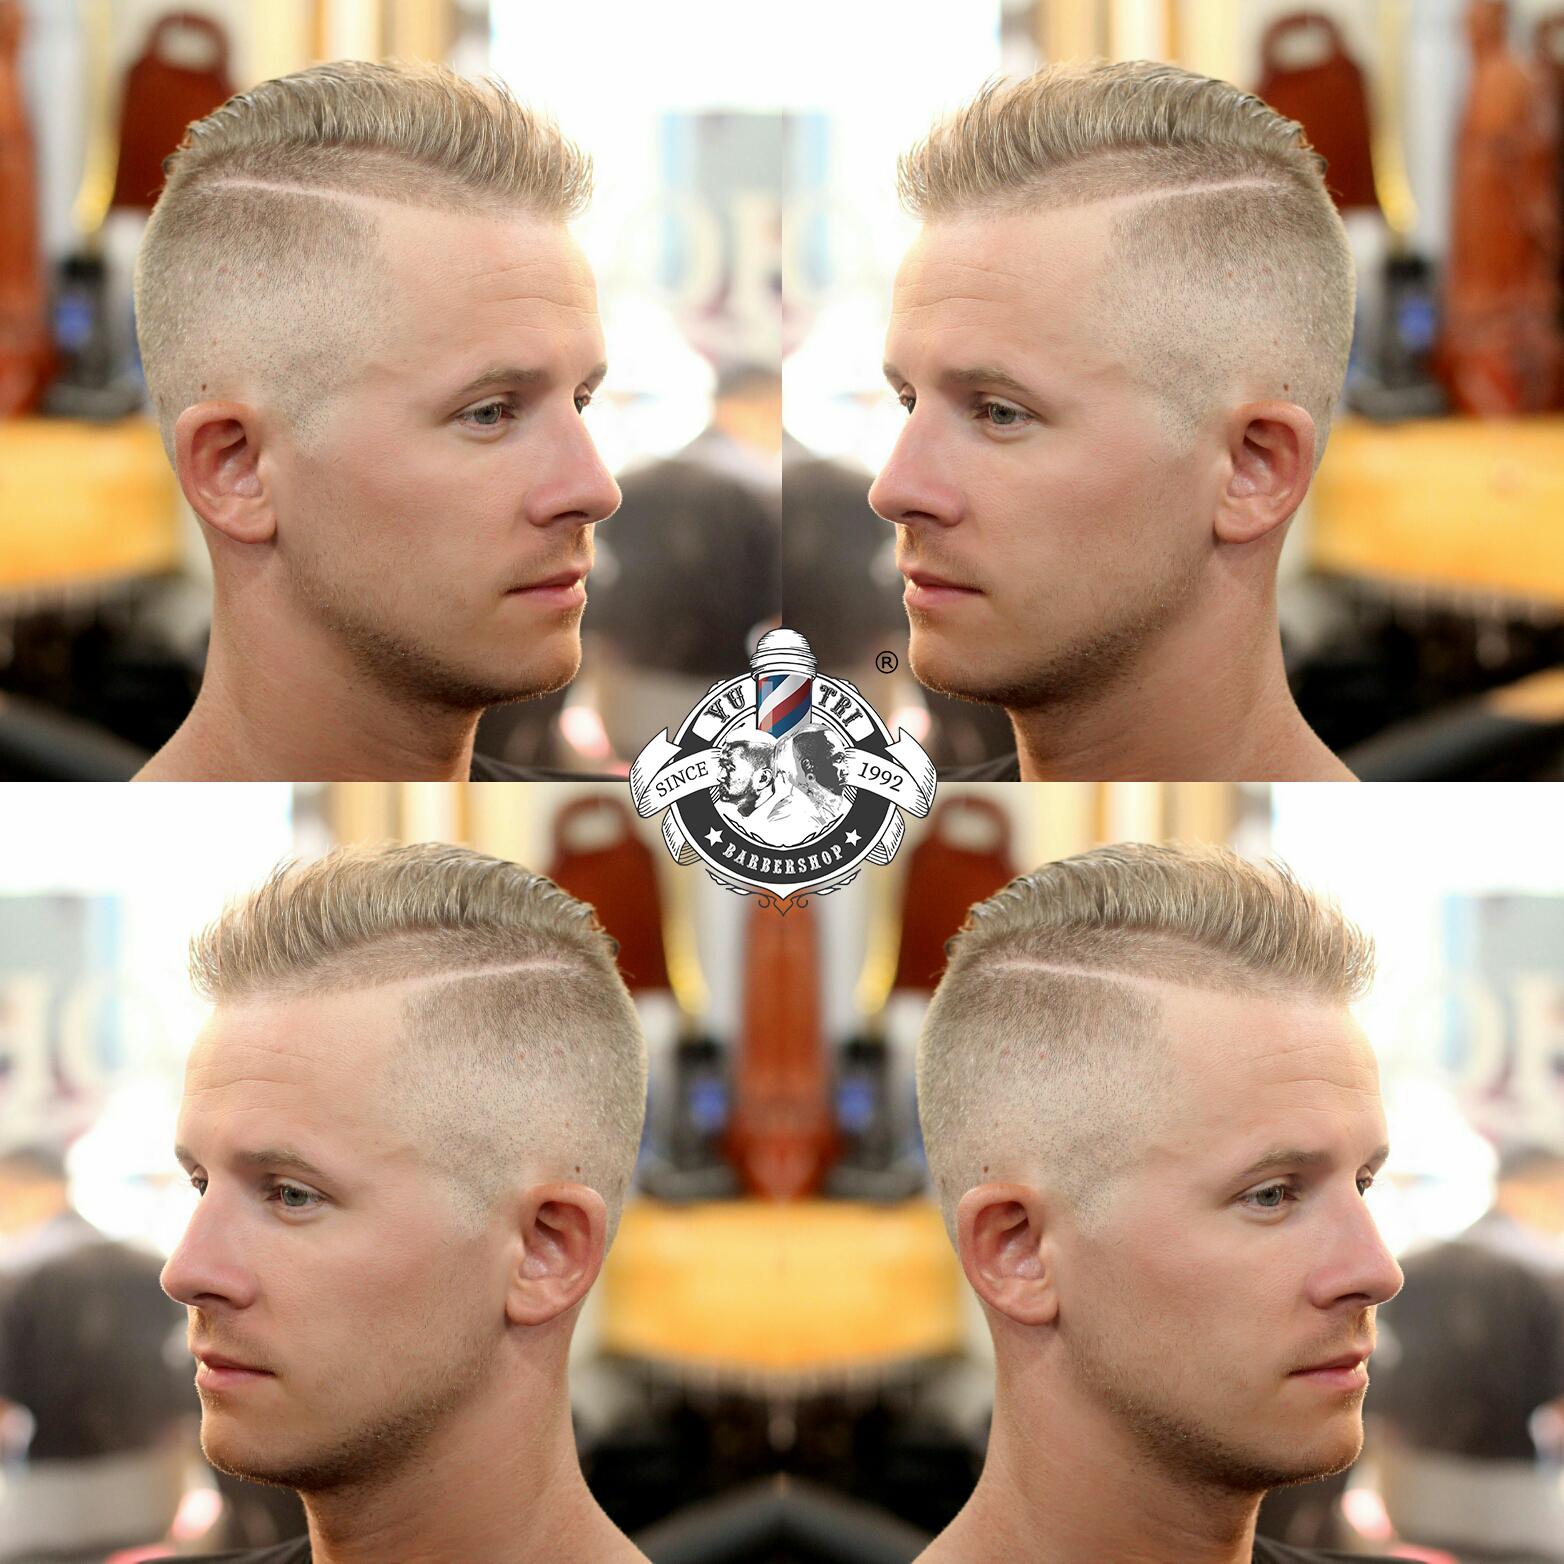 Barber shop Vũ Trí